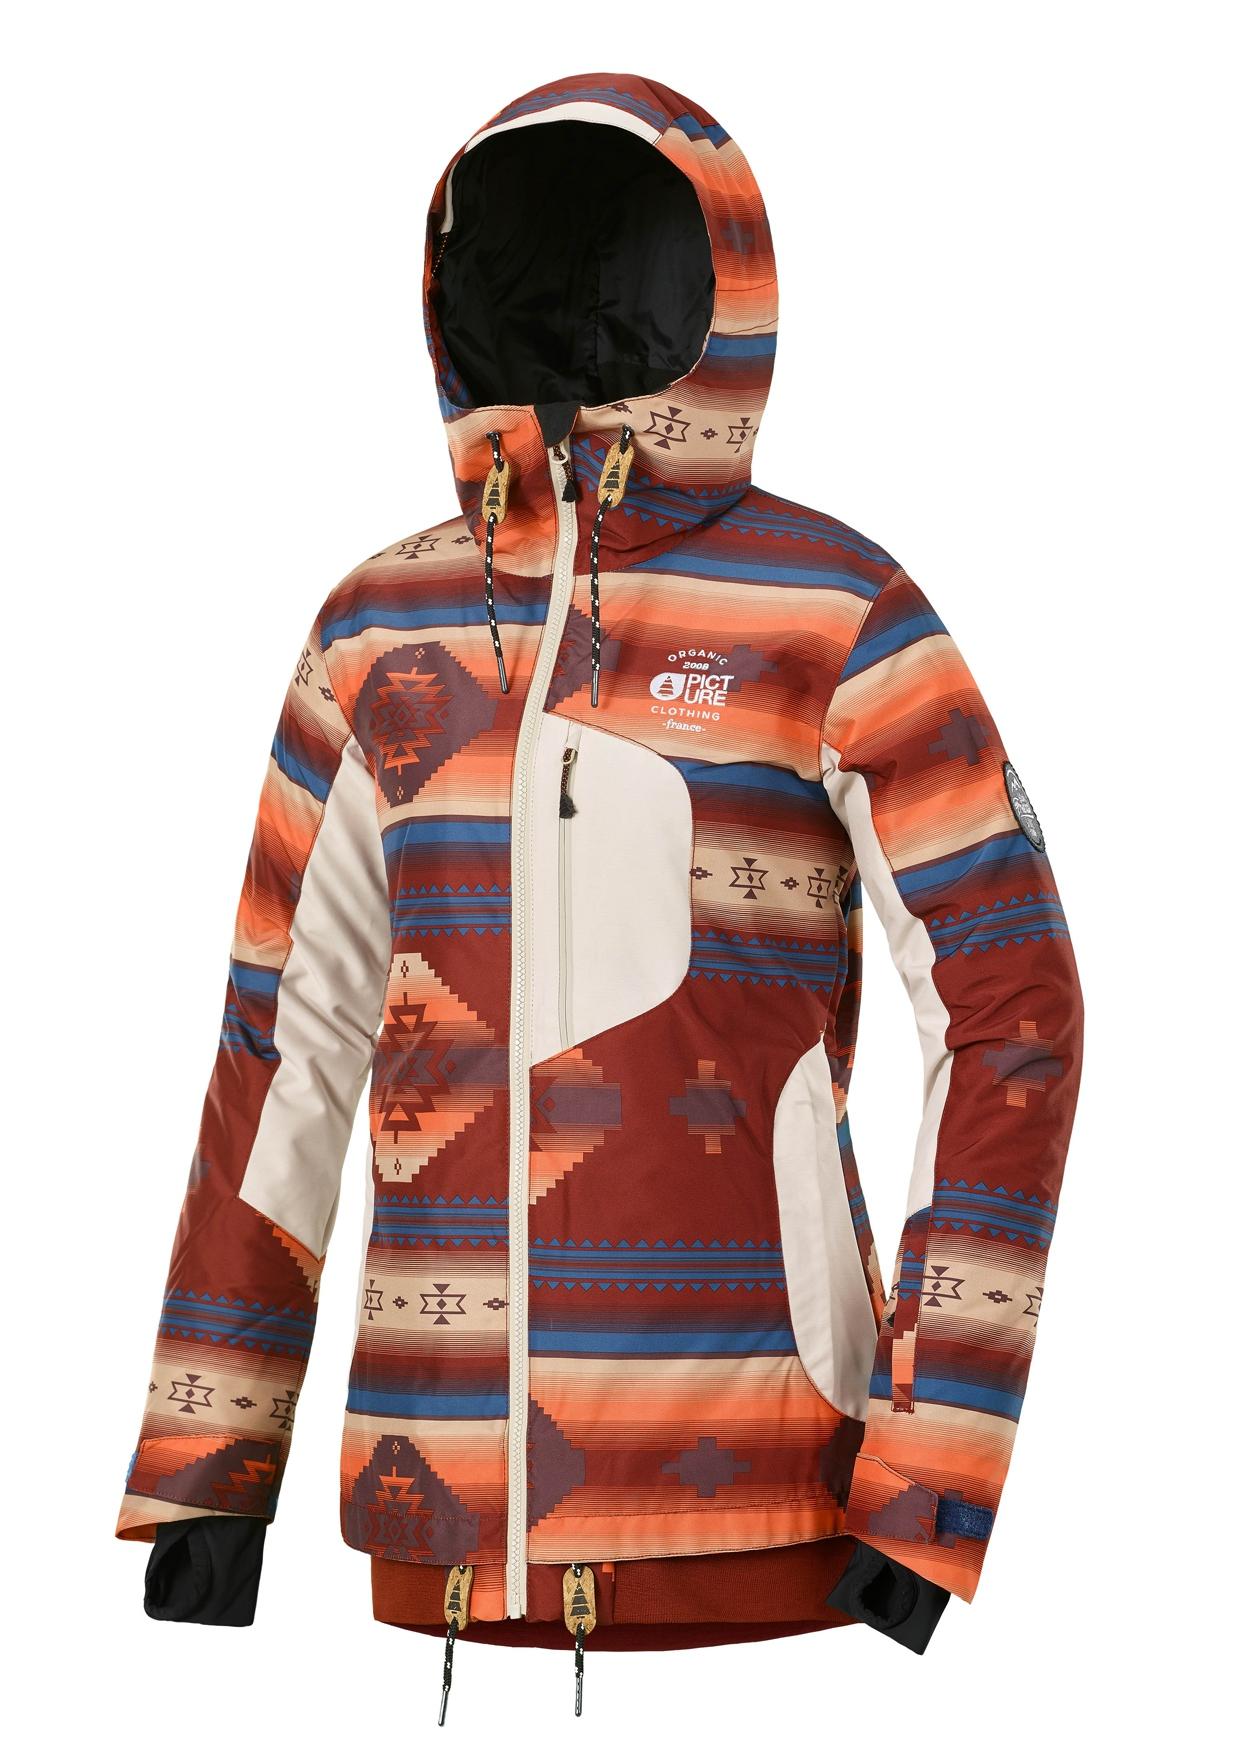 Milk Print Picture Clothing Ski Vestes Jkt Organic Snowleader Navajo qppOW6wC